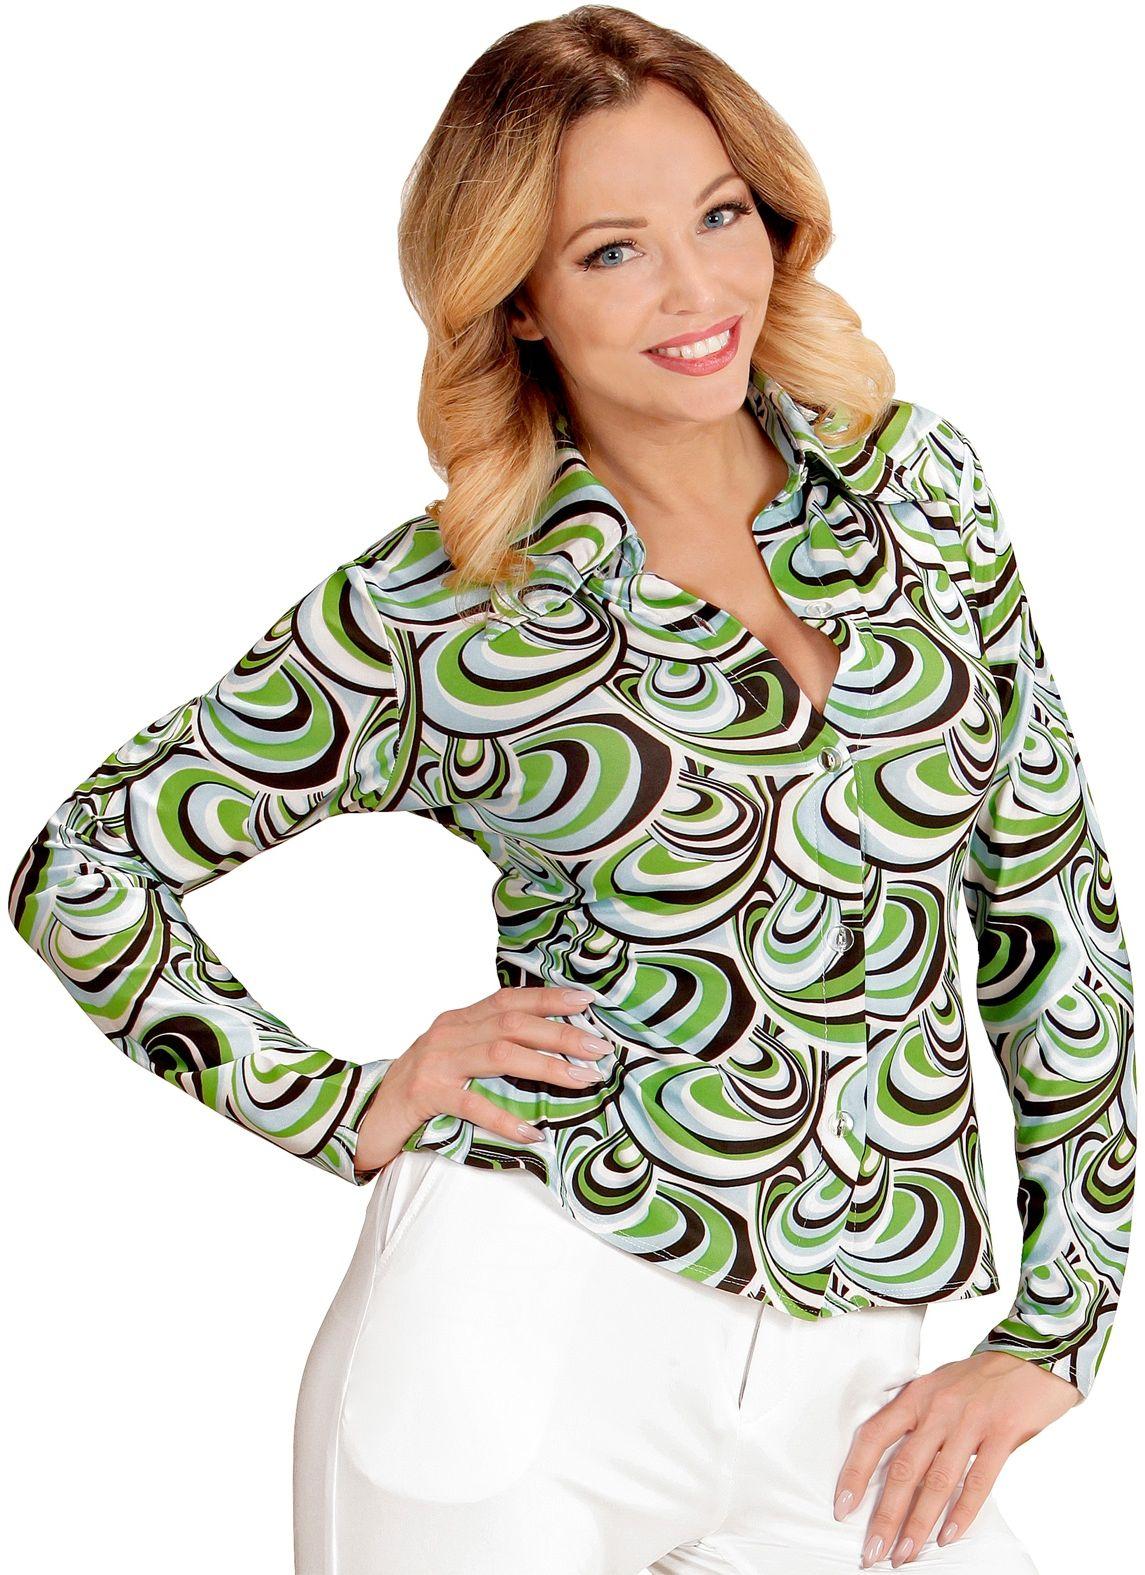 Groovy 70s shirt dames